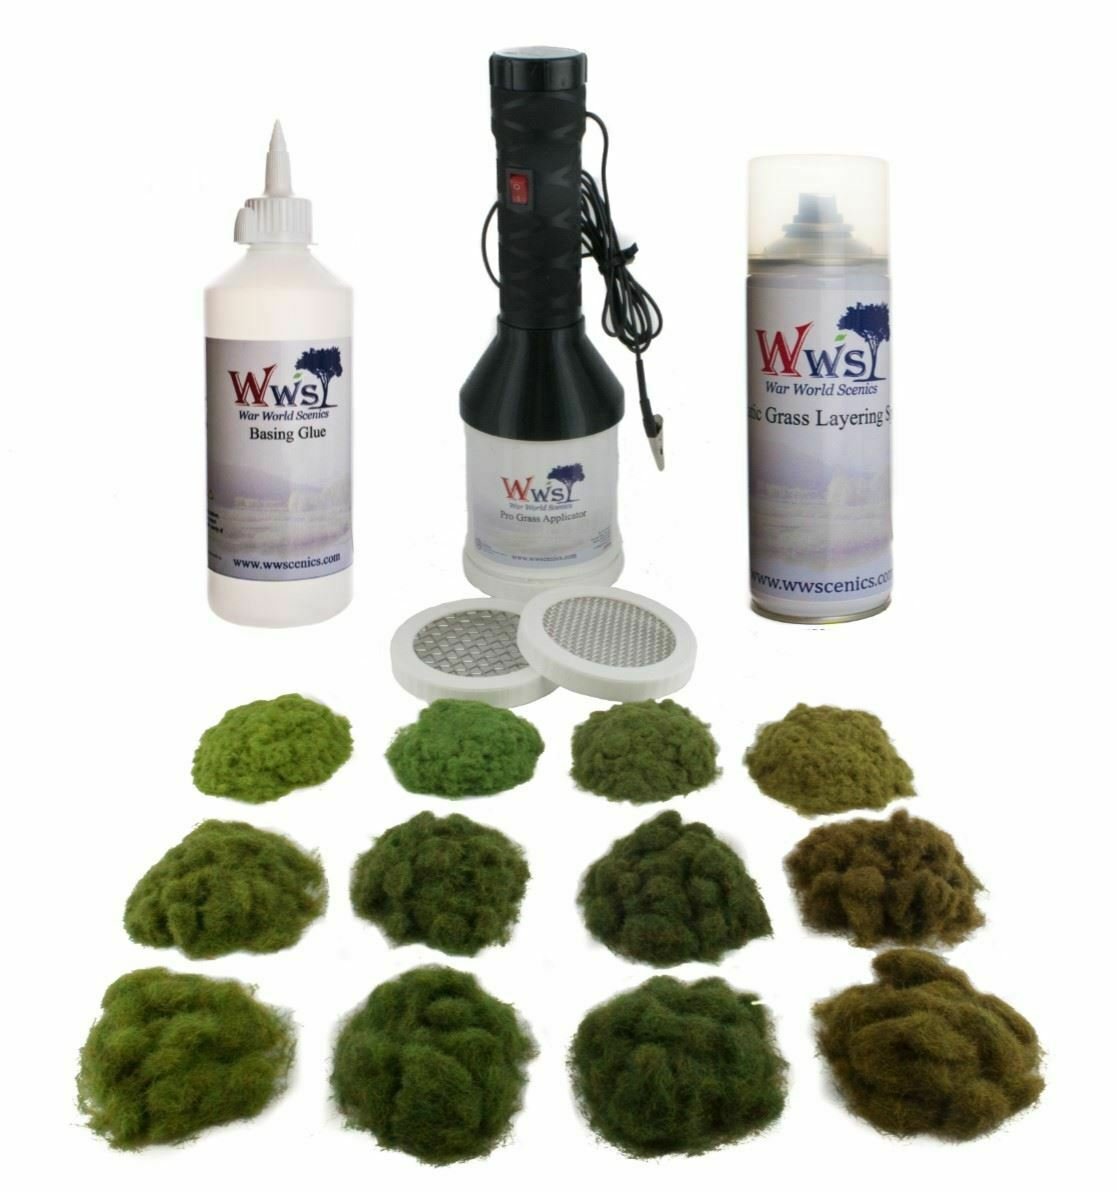 Seleccione de las marcas más nuevas como WWS Applicatore Pro Pro Pro Grass Grand Erba Statica Kit 4 Stagioni con Colla  para barato